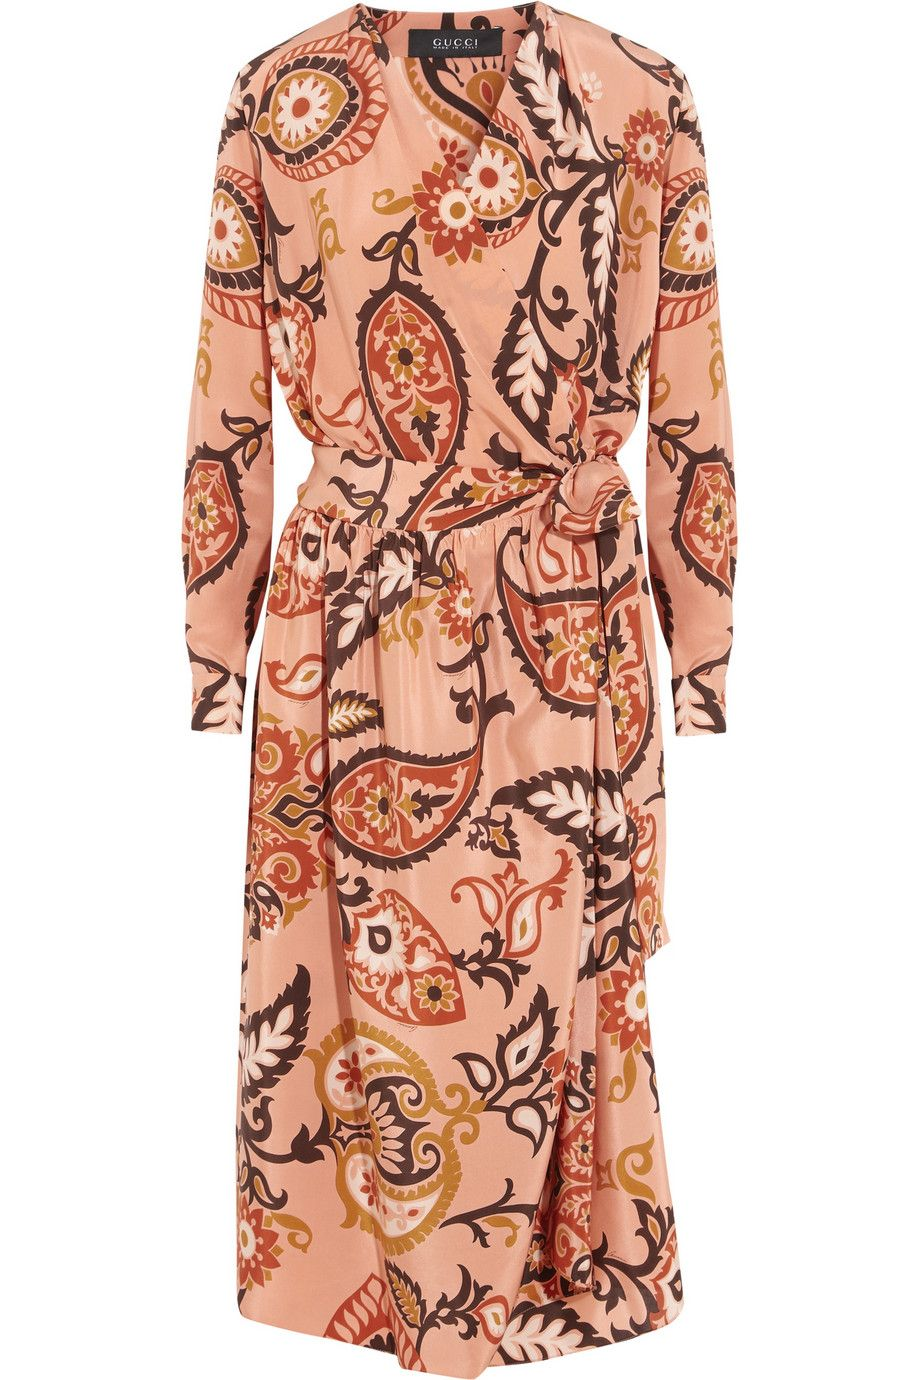 b3c416fae2b GUCCI Printed Silk Wrap Dress.  gucci  cloth  dress